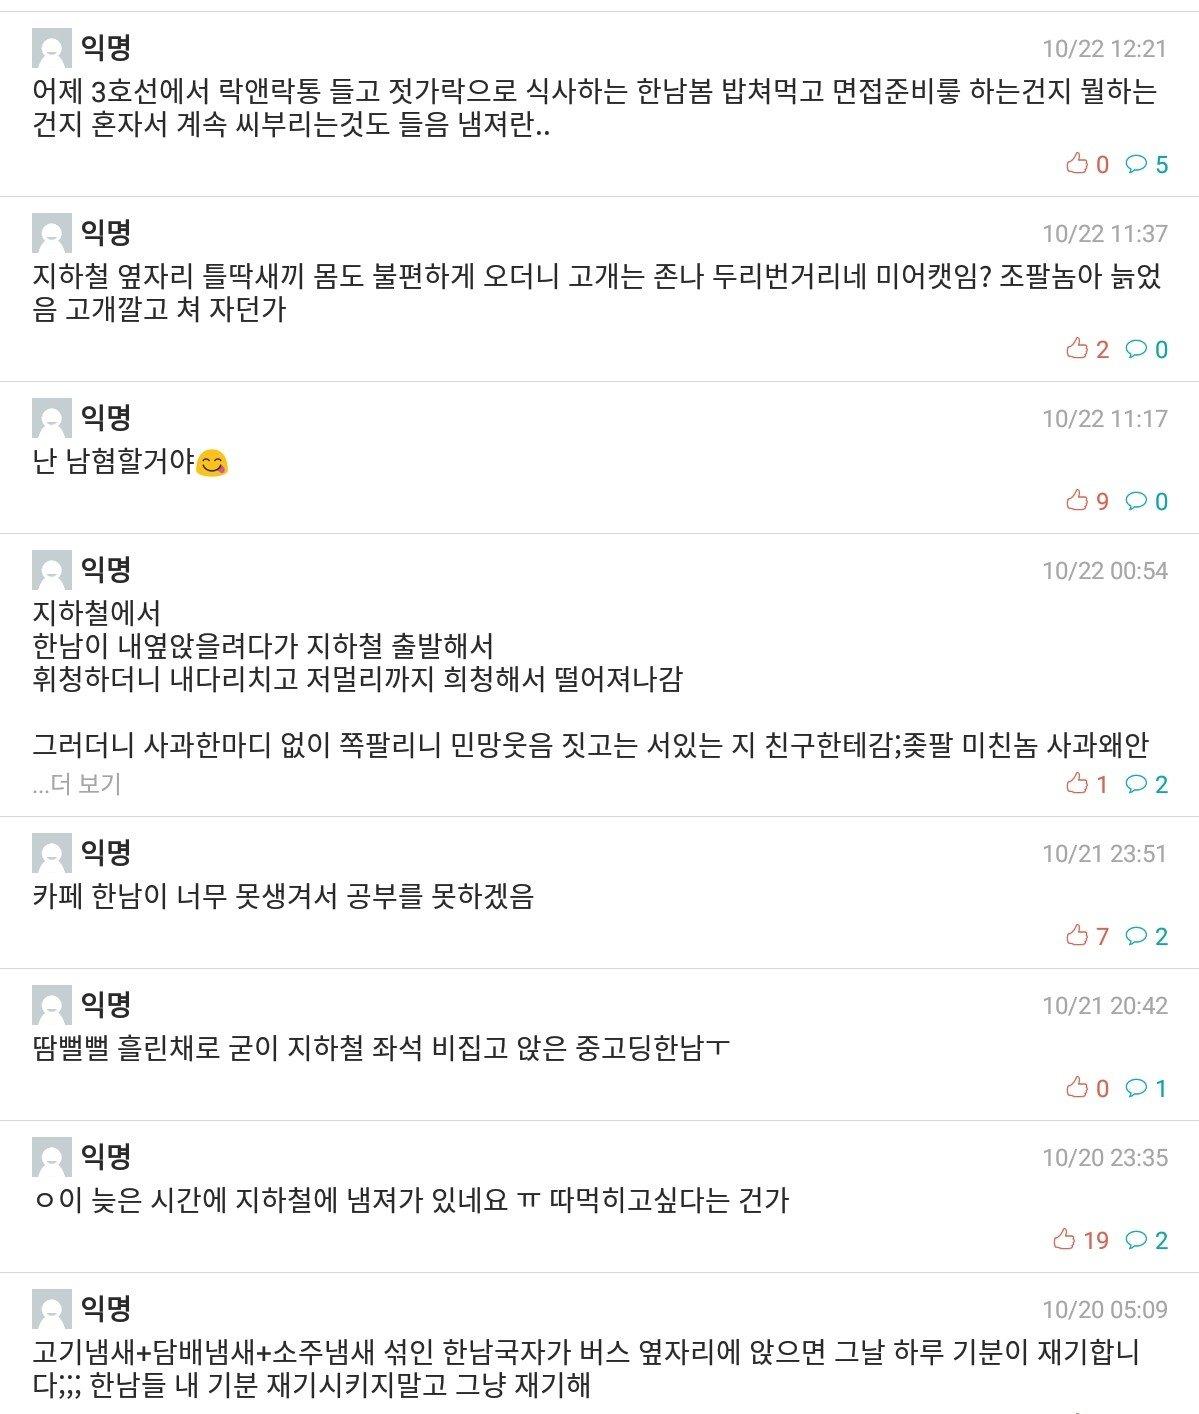 Screenshot_2018-10-31-14-14-30-930.jpeg (혐오)동덕여대 에타 게시판